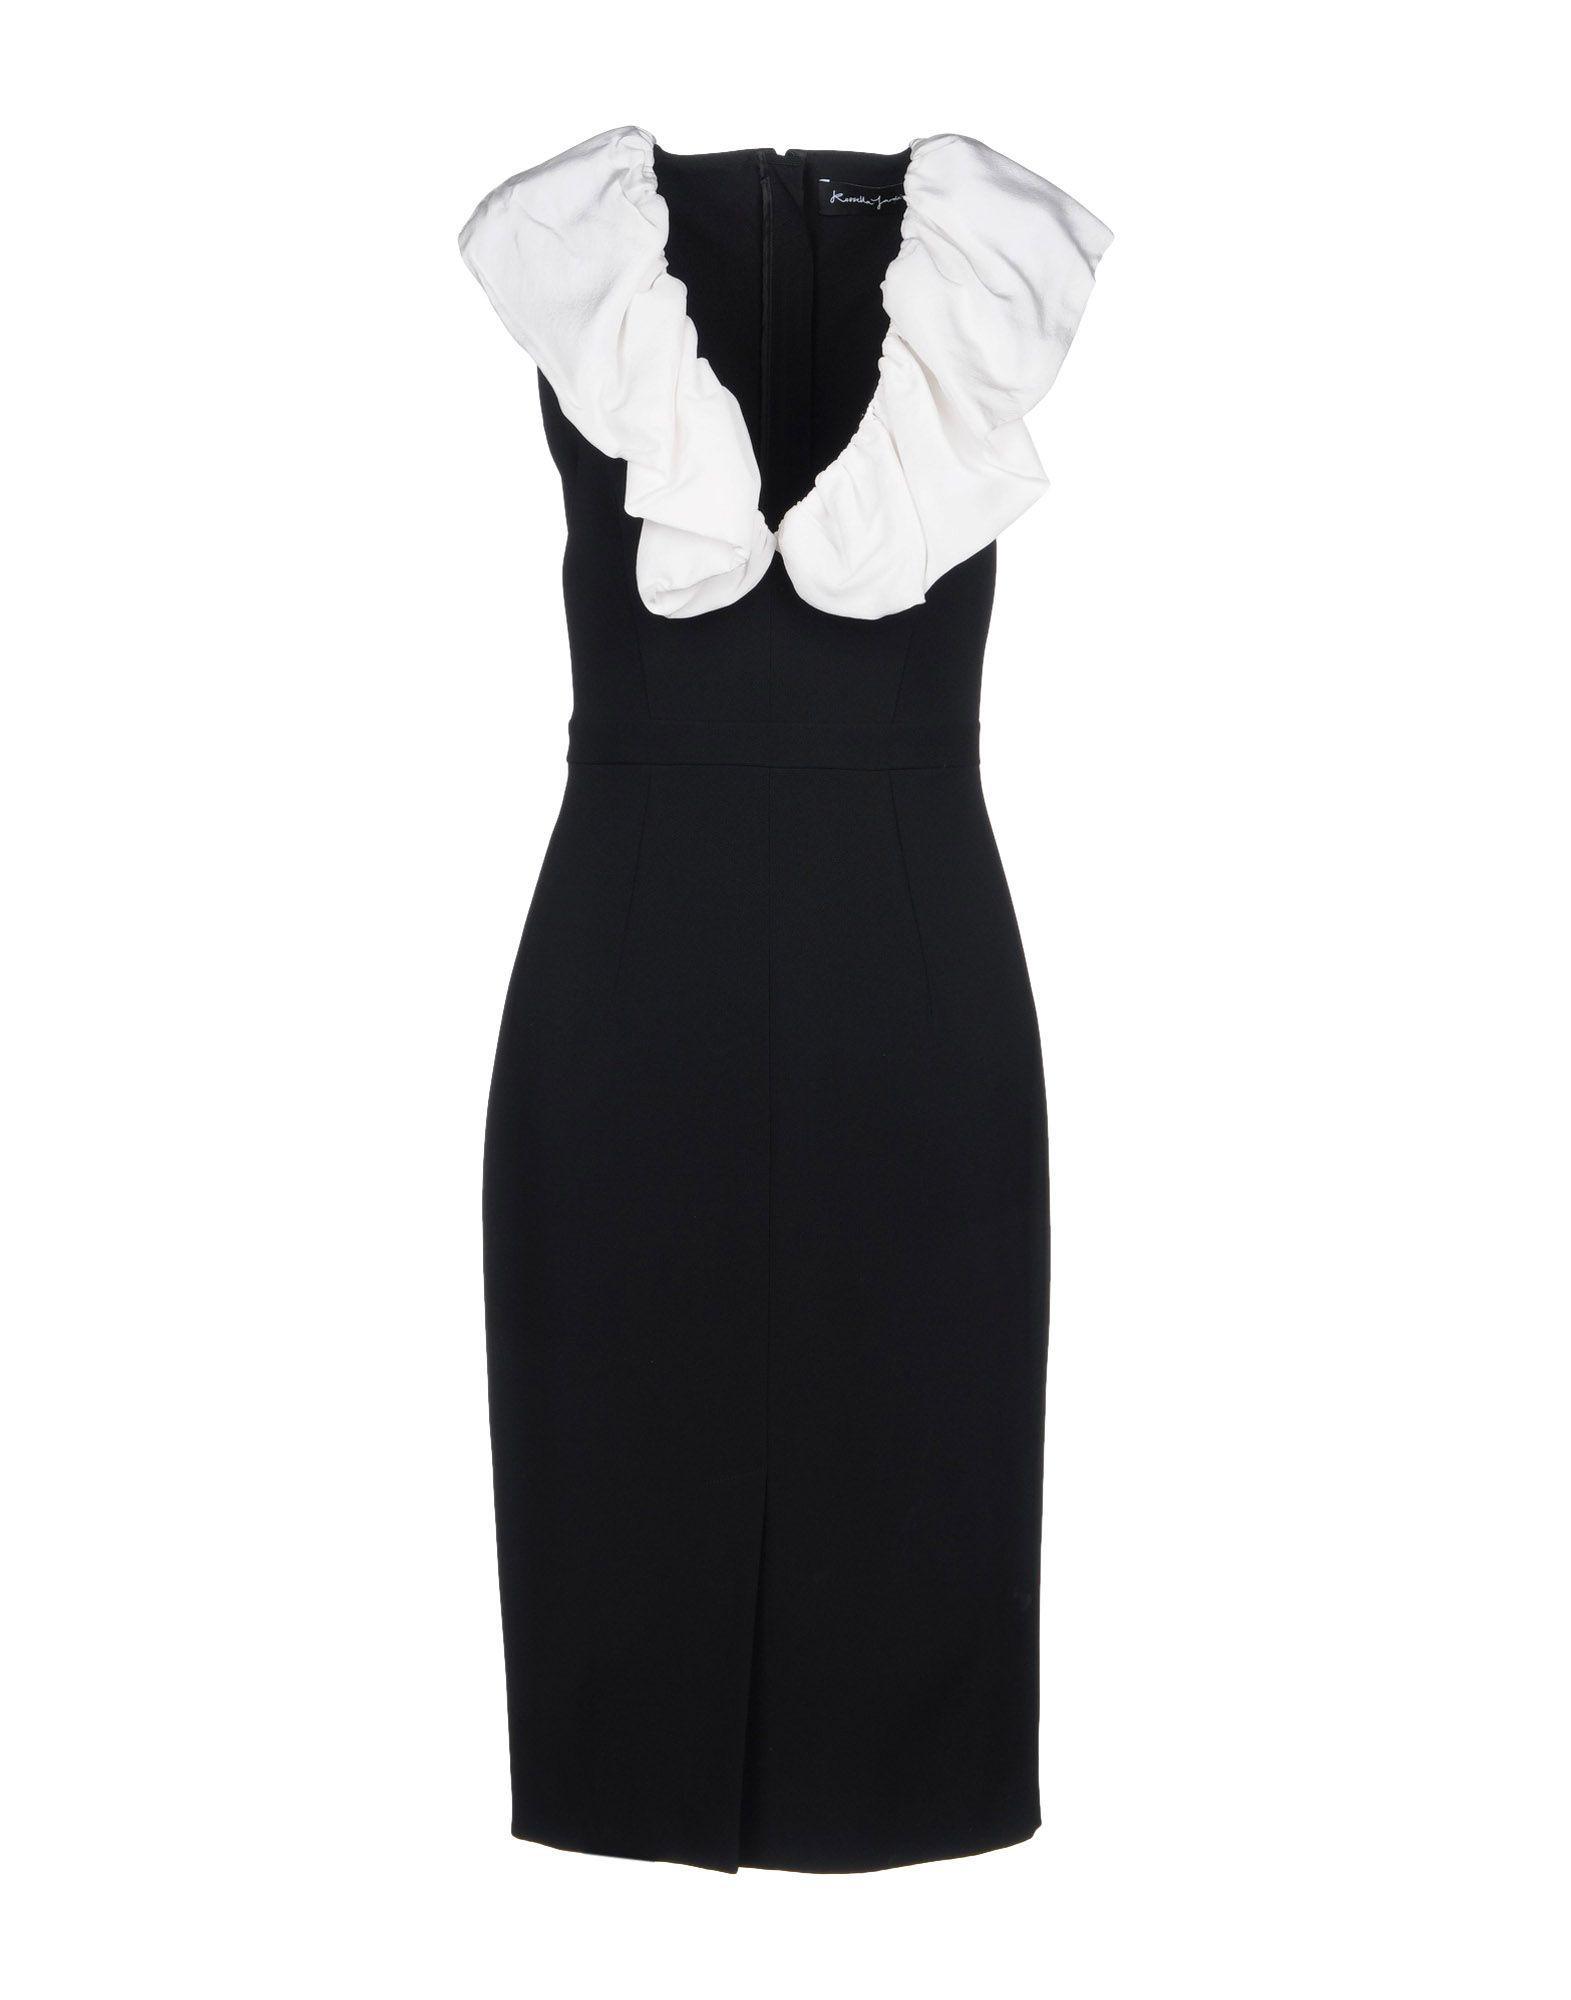 DRESSES - Knee-length dresses Rossella Jardini LKzFCk